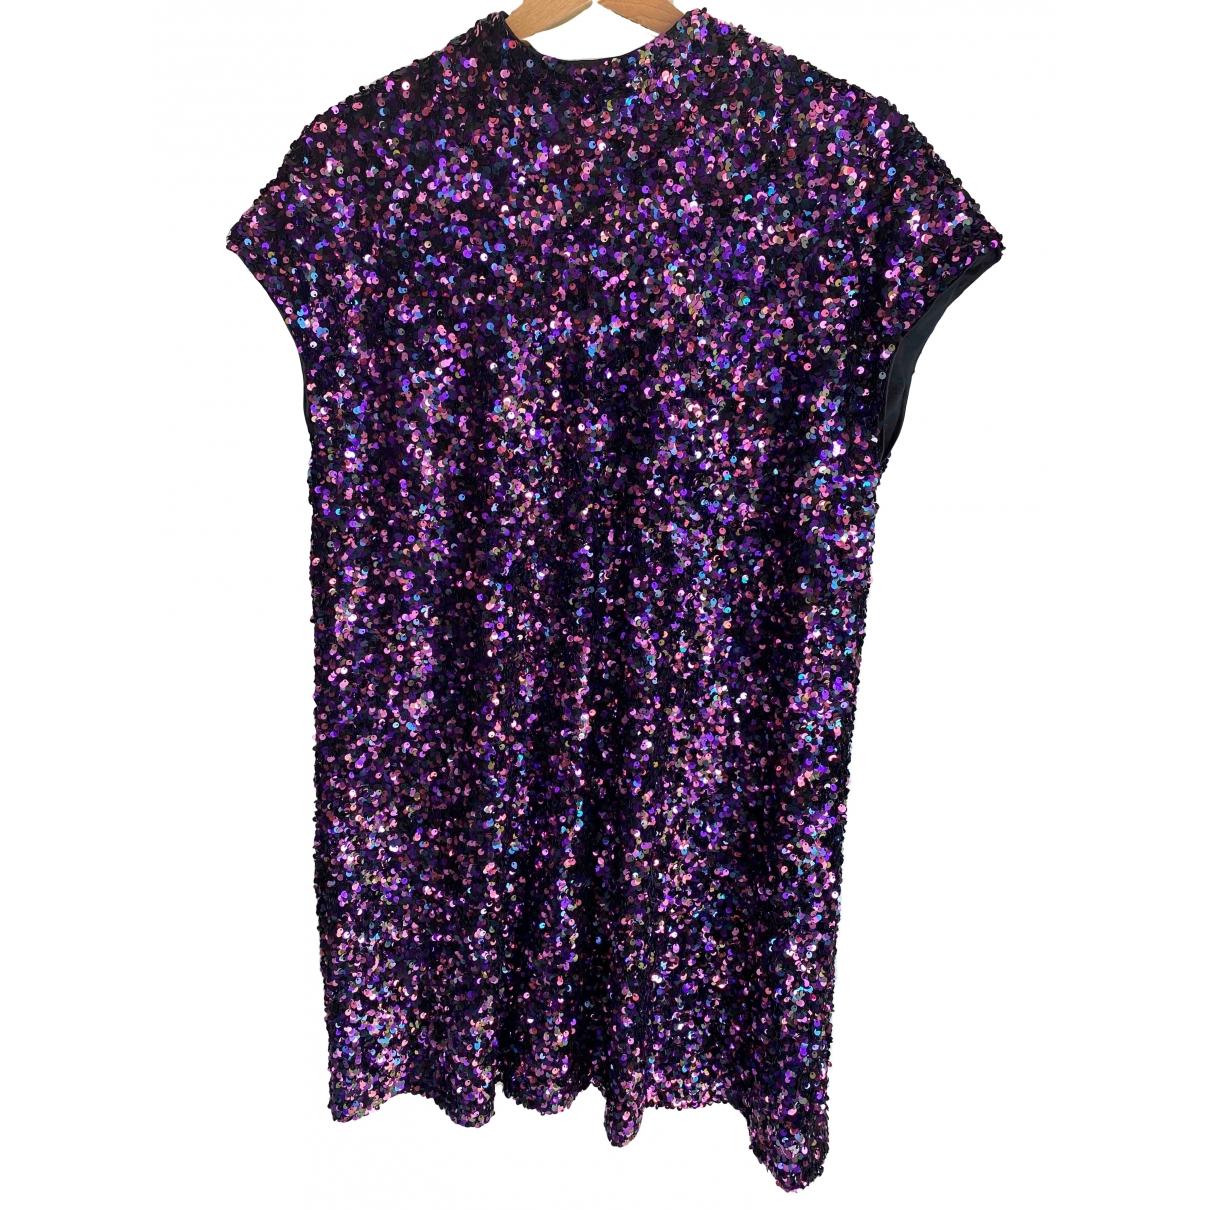 Zara \N Kleid in  Lila Mit Pailletten